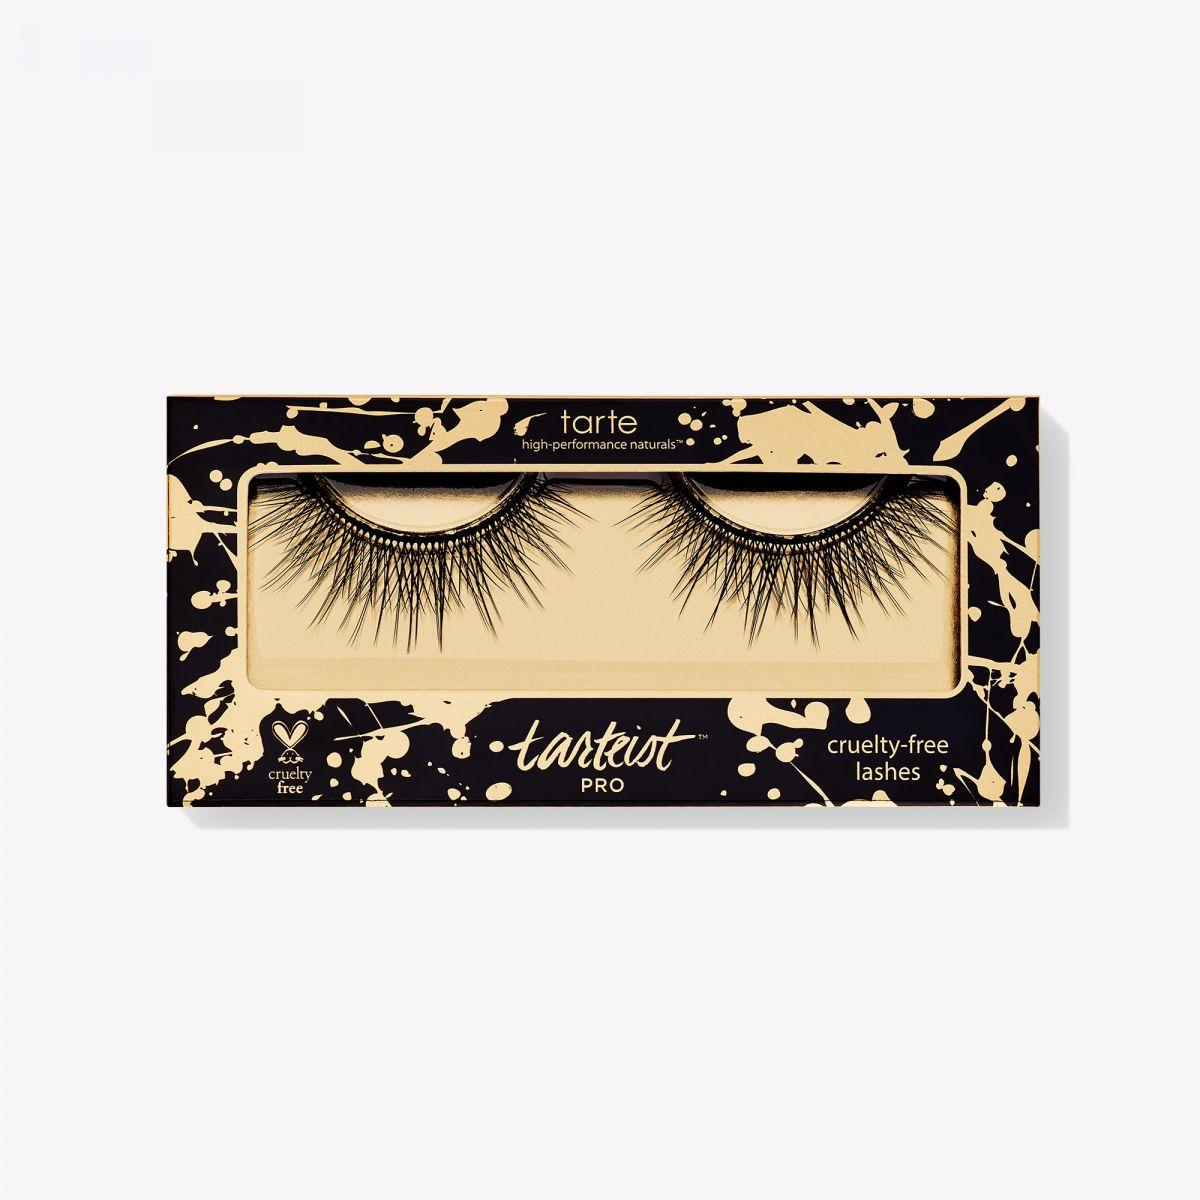 Ресницы Tarte Cosmetics - Flirt (Lengthening) tarteist™ PRO cruelty-free lashes